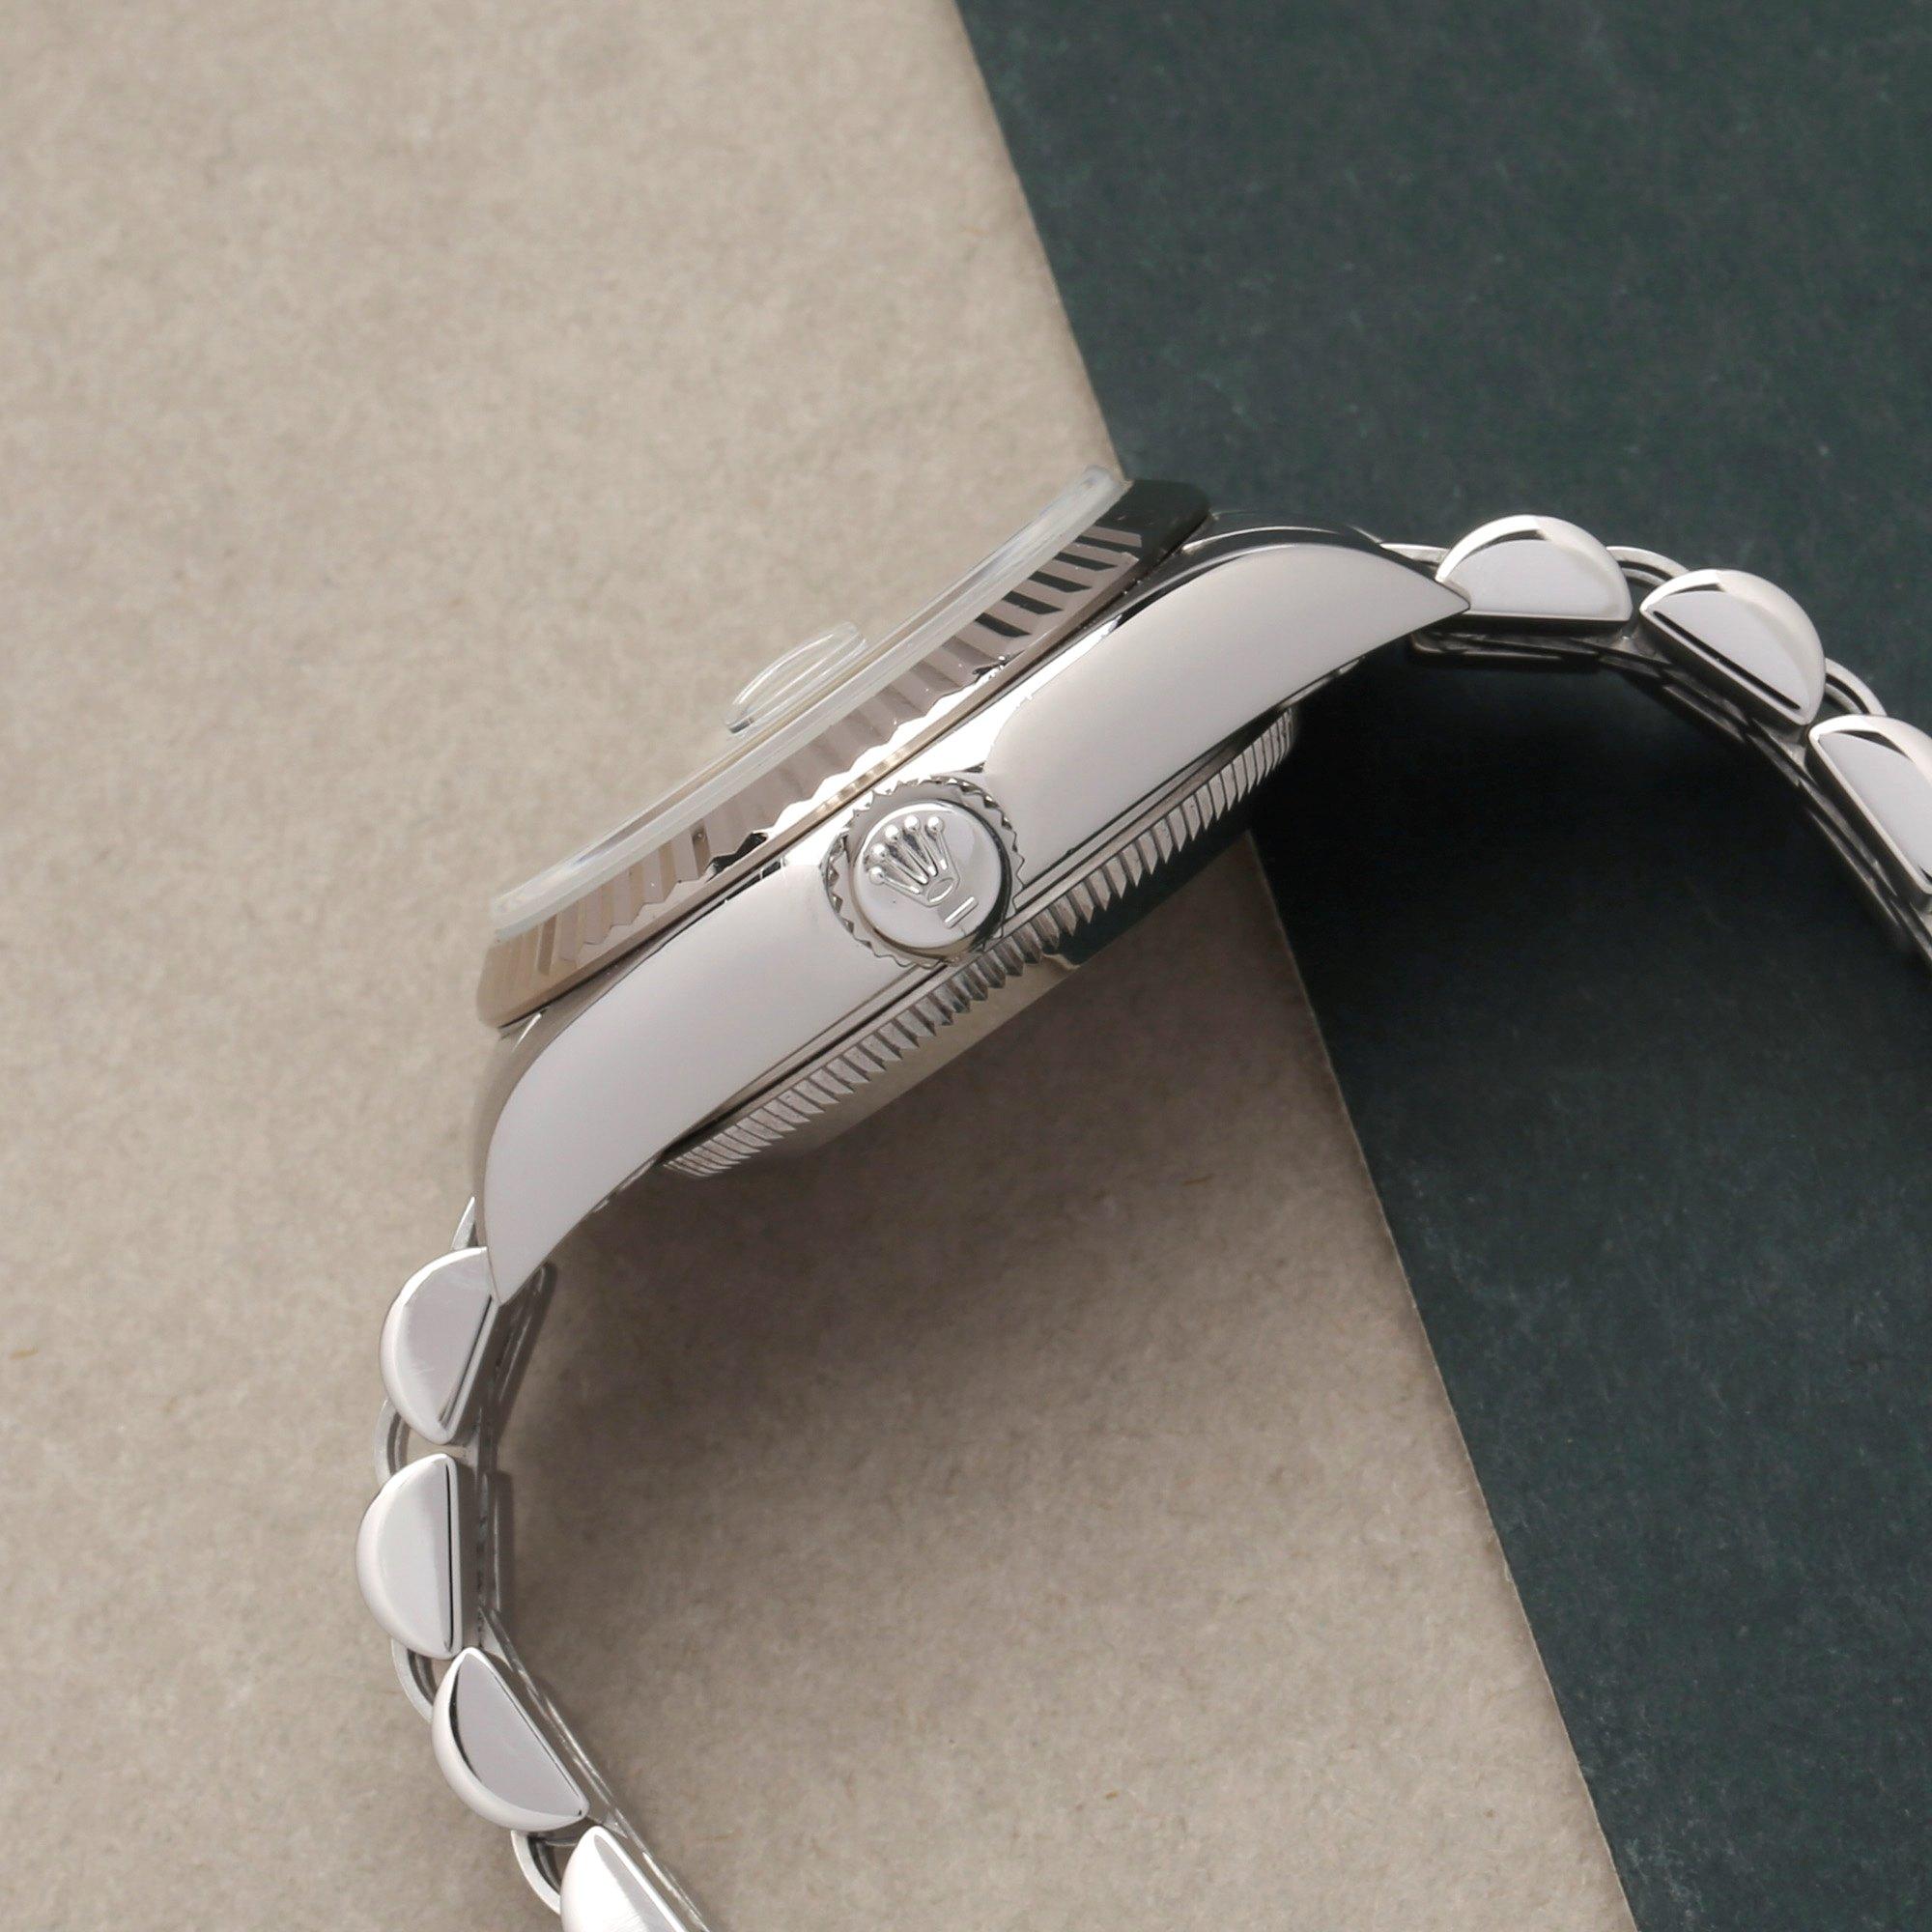 Rolex Datejust 26 18K White Gold & Stainless Steel 79174